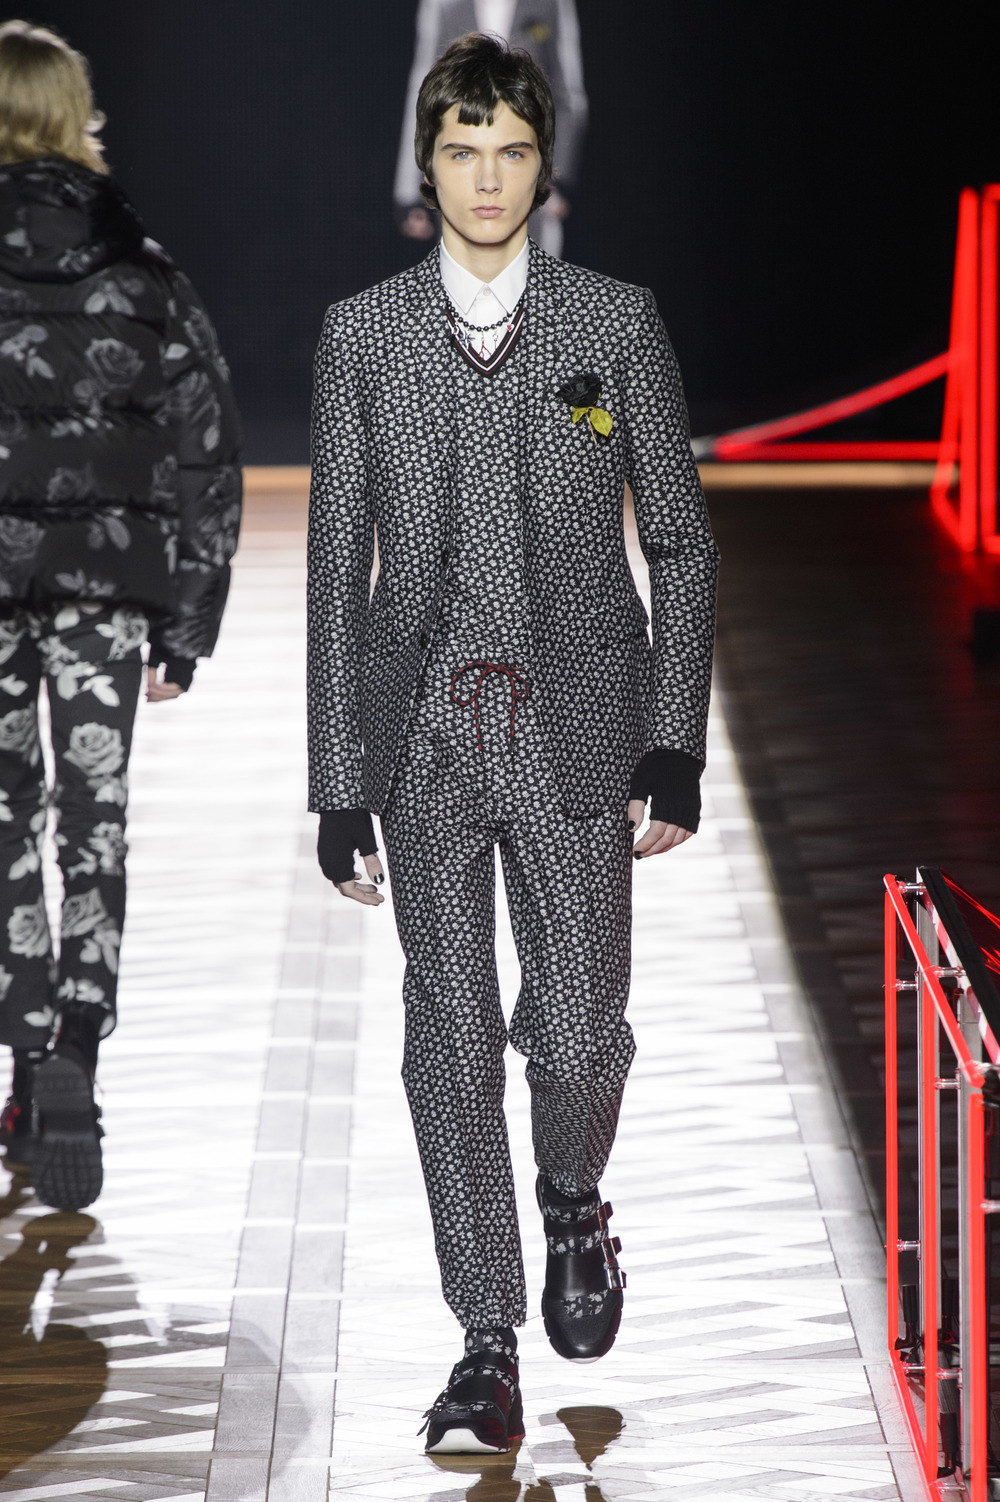 Dior_Homme_Hiver2016-17_look_48.JPG